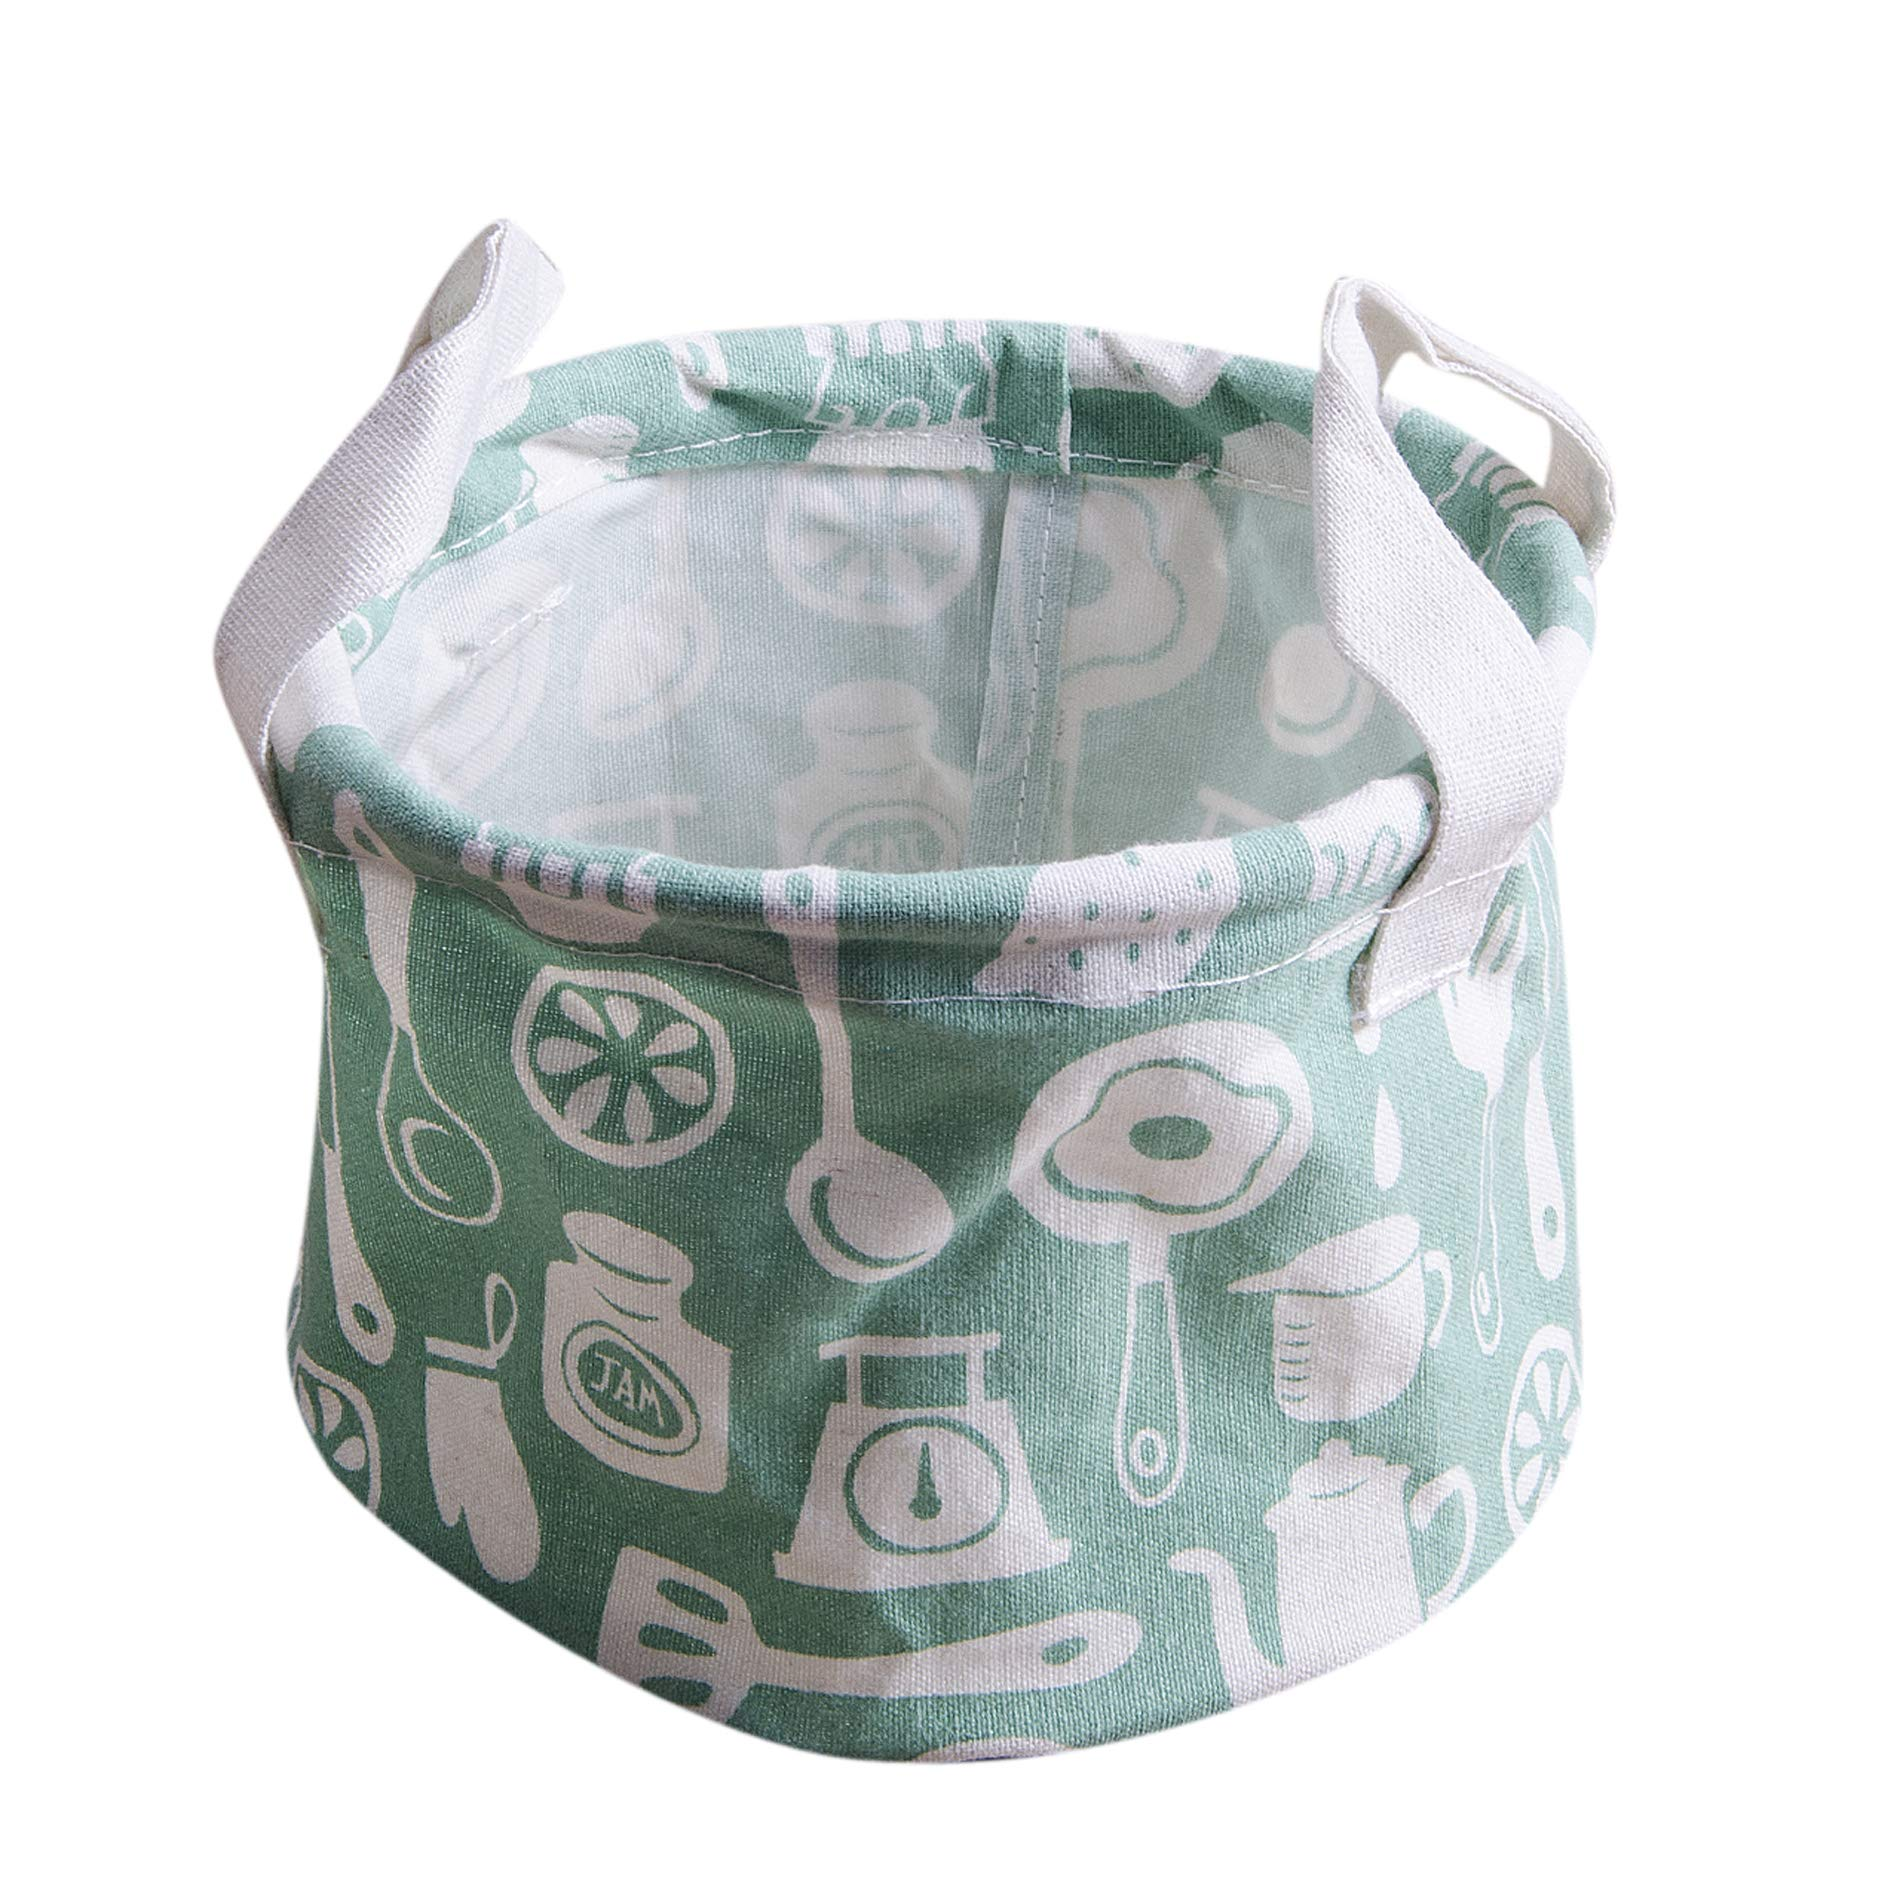 KMSUNME Fabric Collection Basket Storage Bowl Plaid Printing Animal Pattern Waterproof Hamper Storage Basket (Green, 1418cm.)